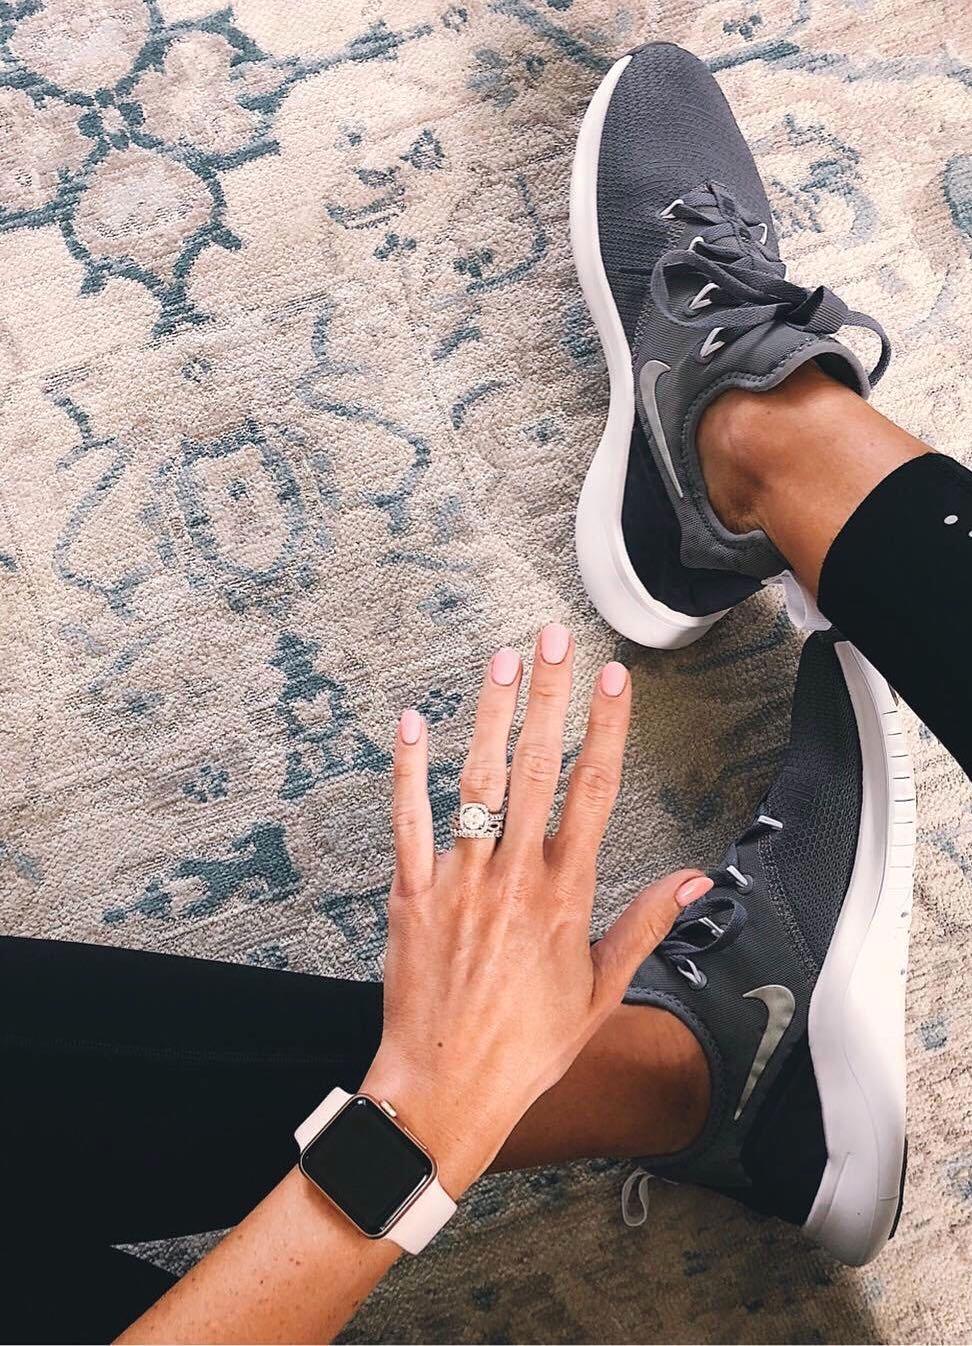 engagement ring selfie fitness attire